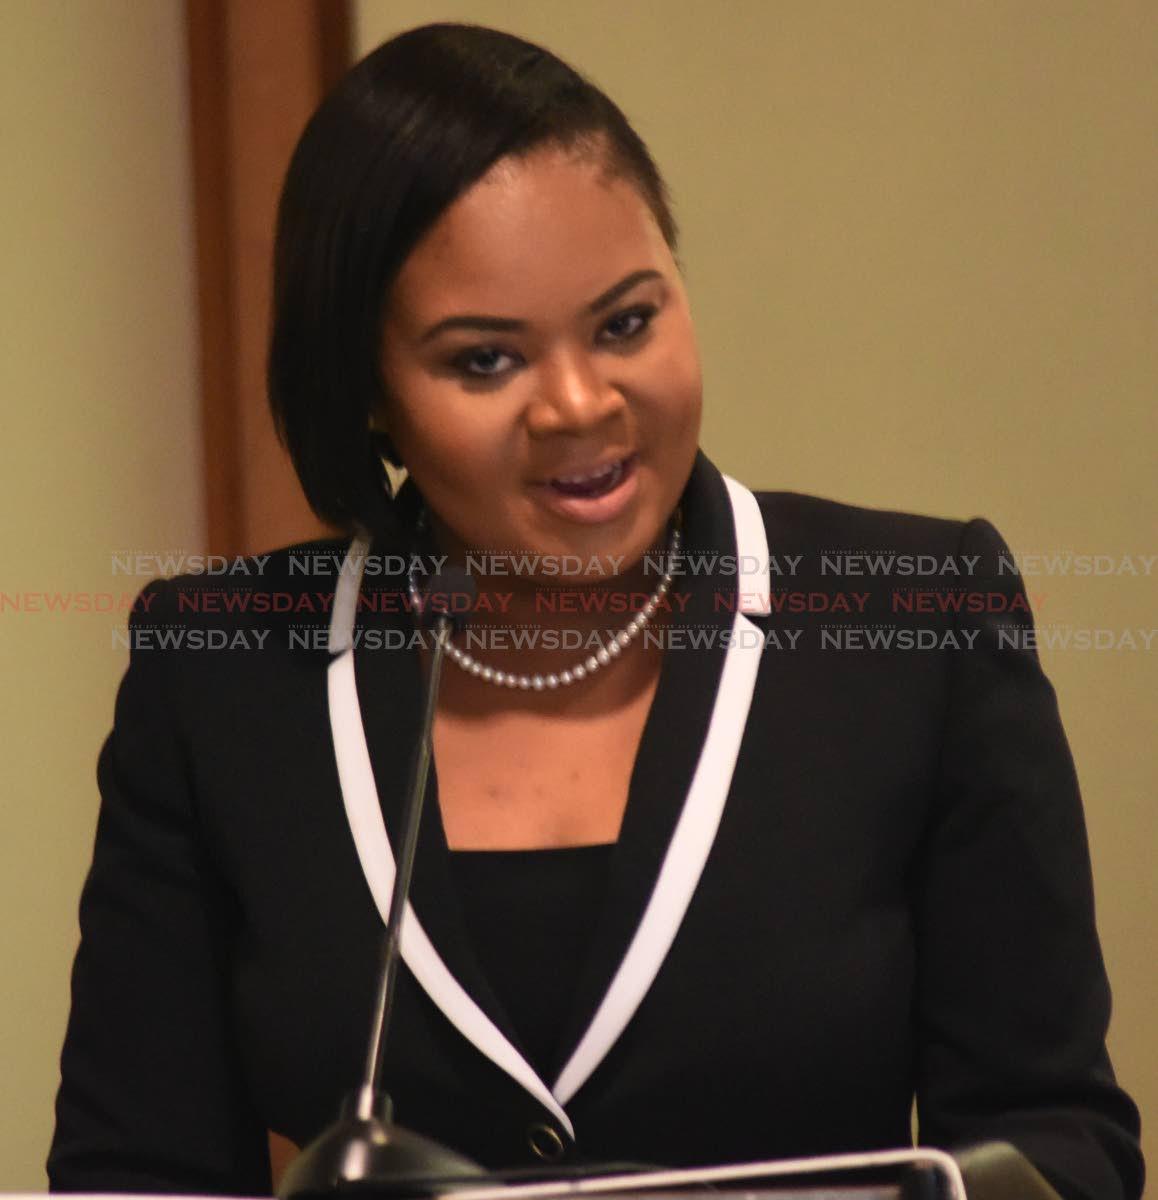 Tobago West MP Shamfa Cudjoe